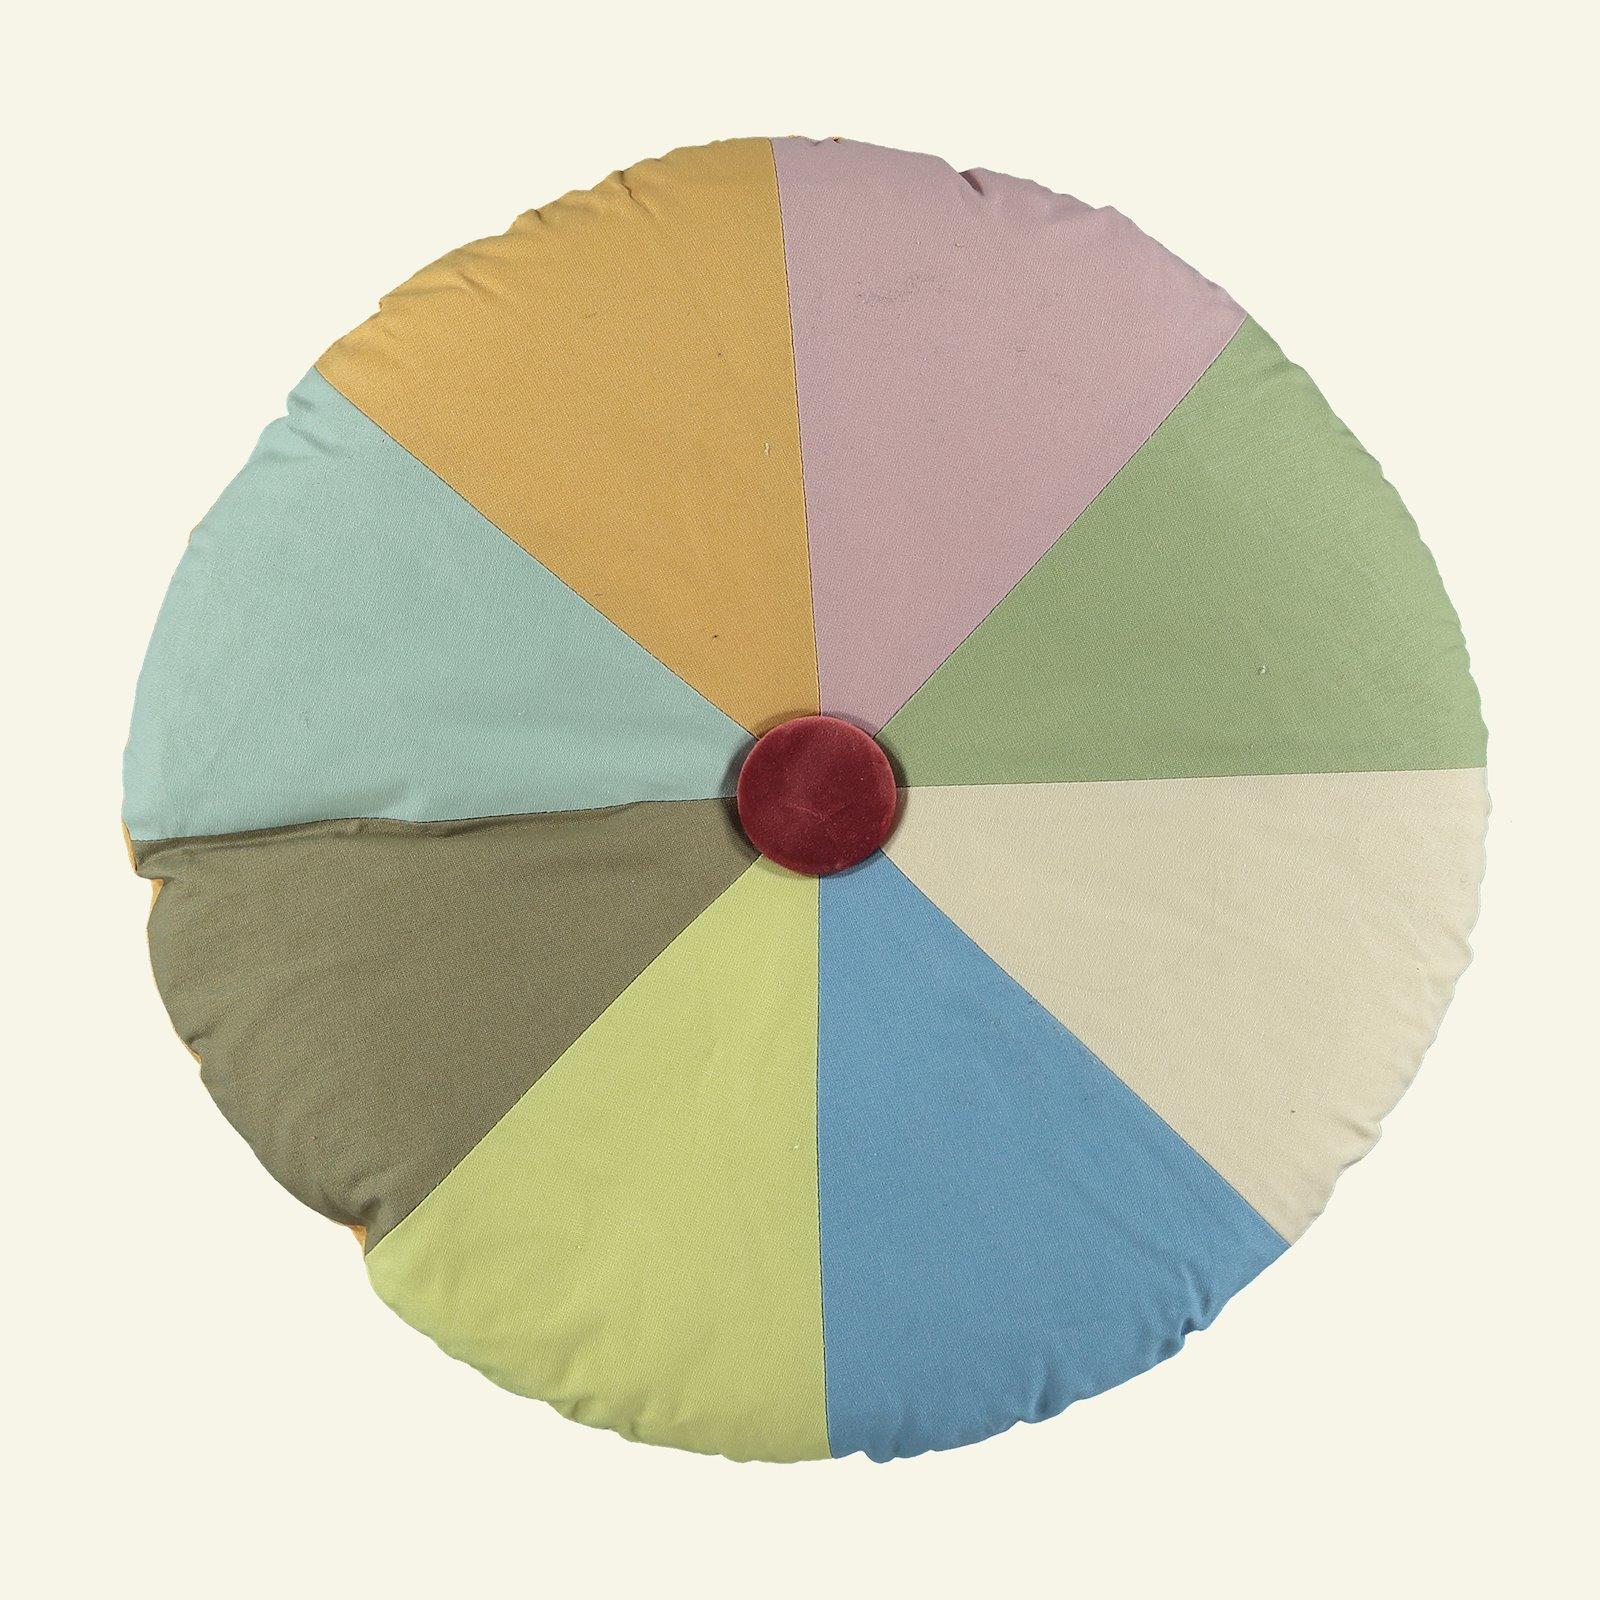 Luxury cotton light dusty violet p90272_4359_4221_4213_4310_4357_4295_4320_4361_40515_sskit